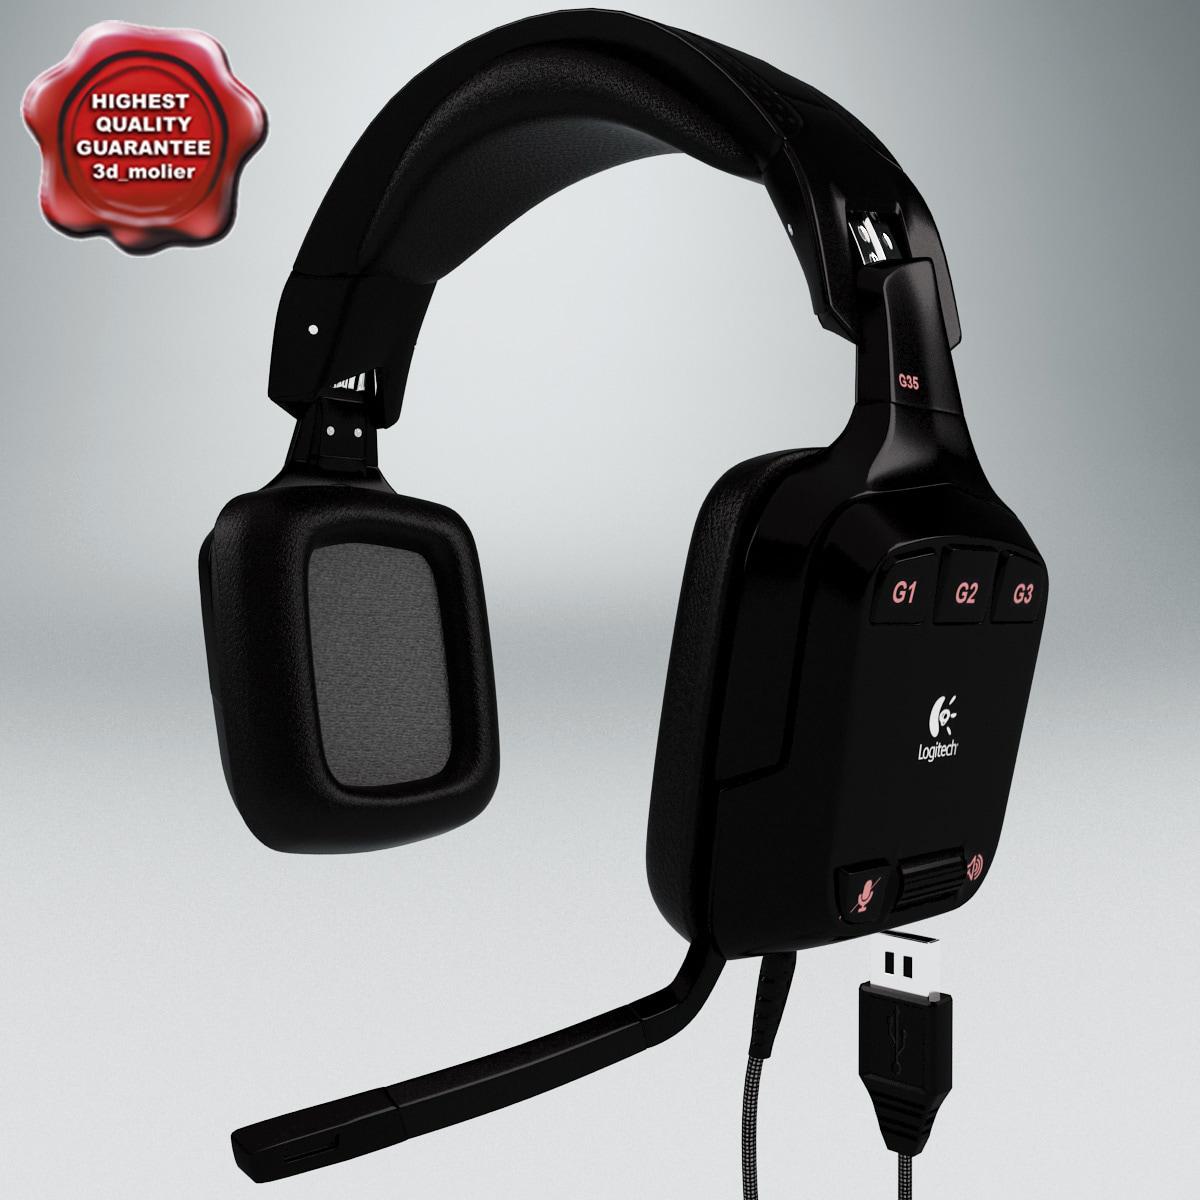 Headphones_Logitech_G35_00.jpg